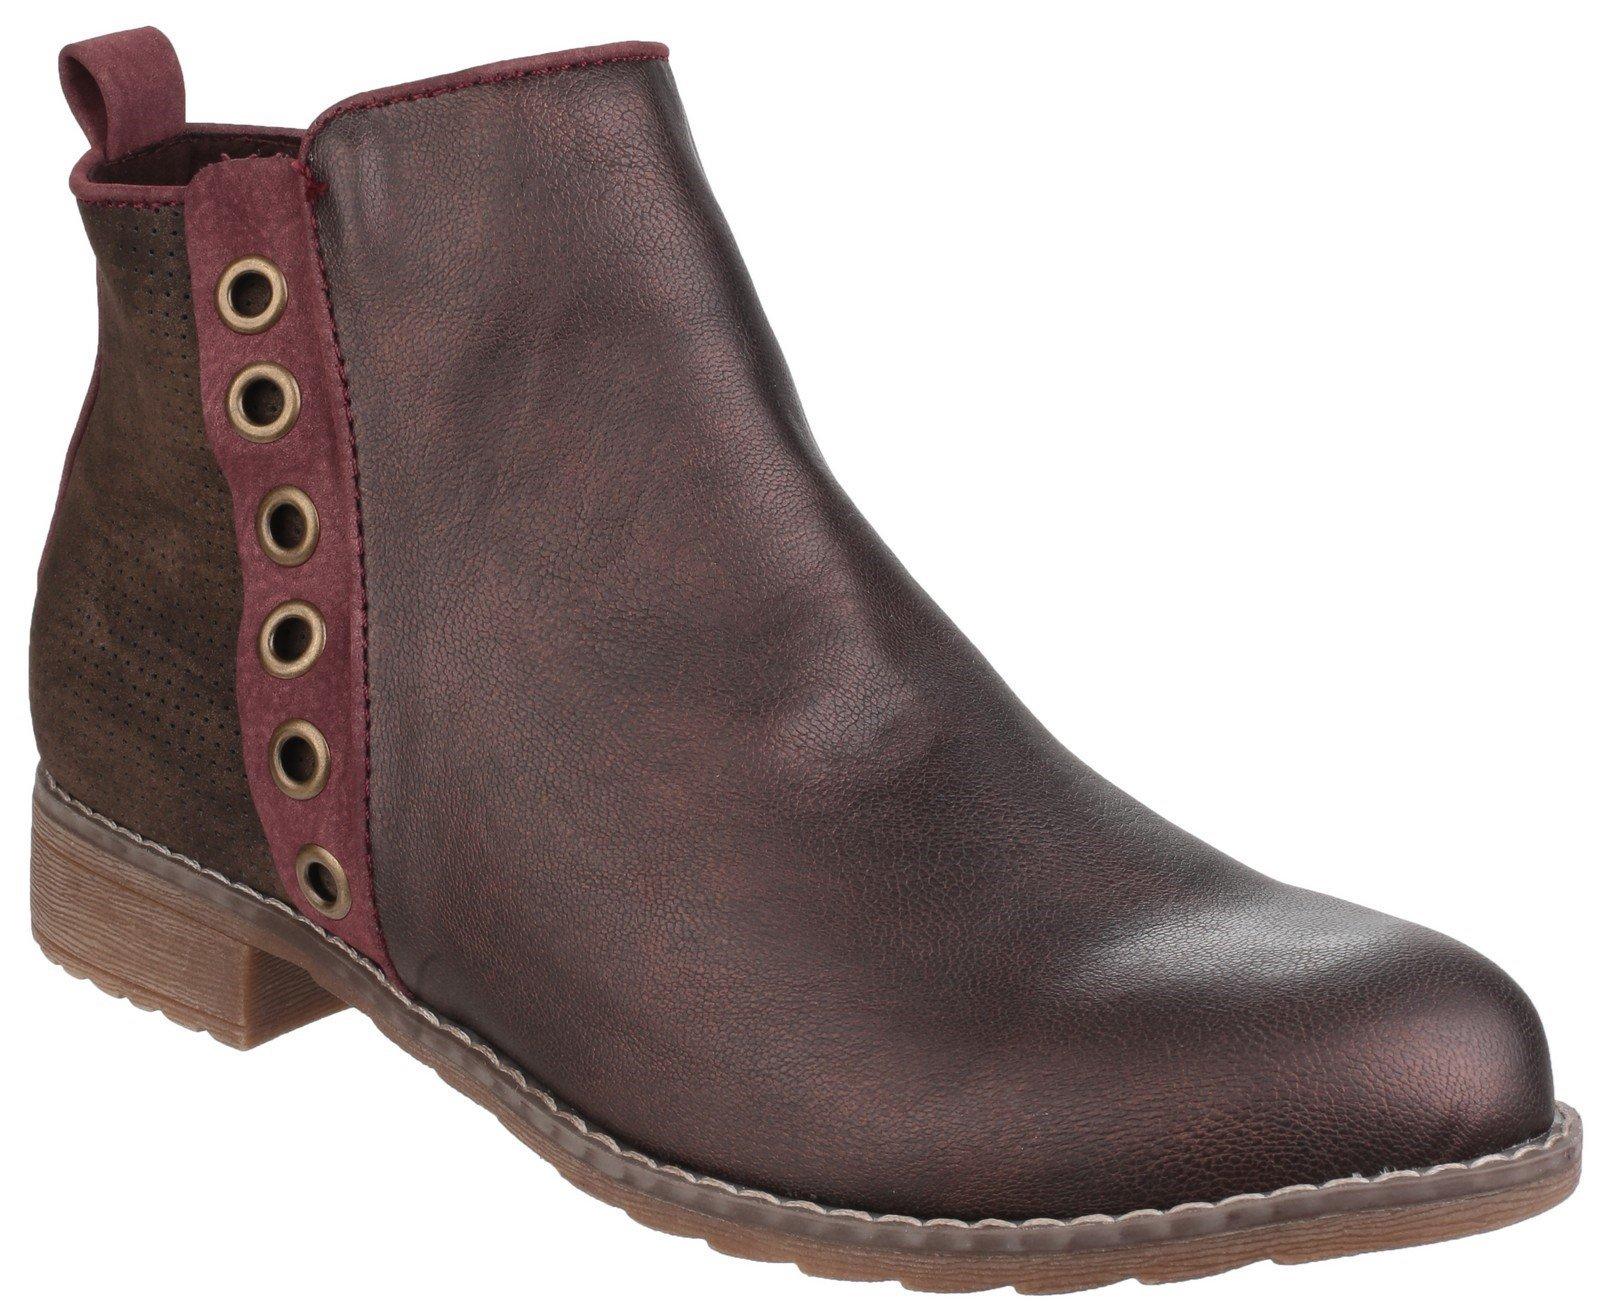 Divaz Women's Demi Pull On Ankle Boot Brown 24274-40026 - Burgundy 3